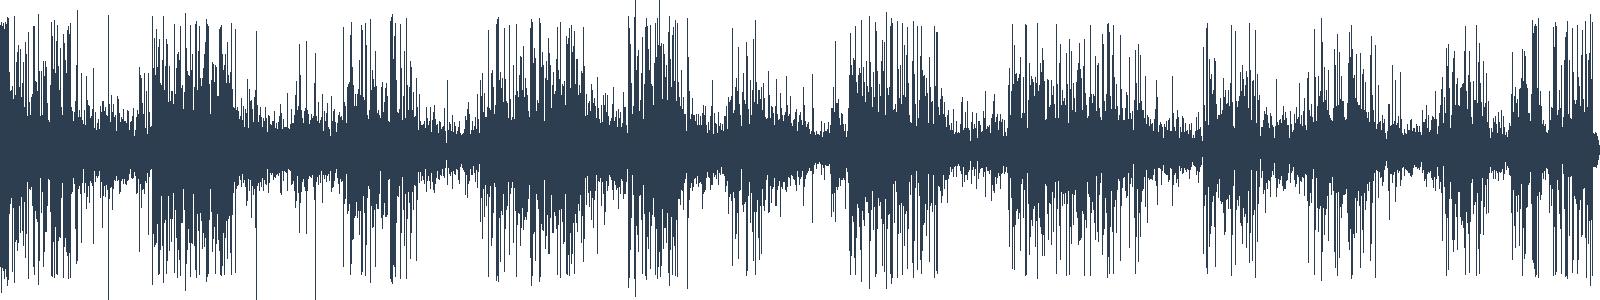 #71 Alaphilippe ovalverdeoval Valverdeho waveform